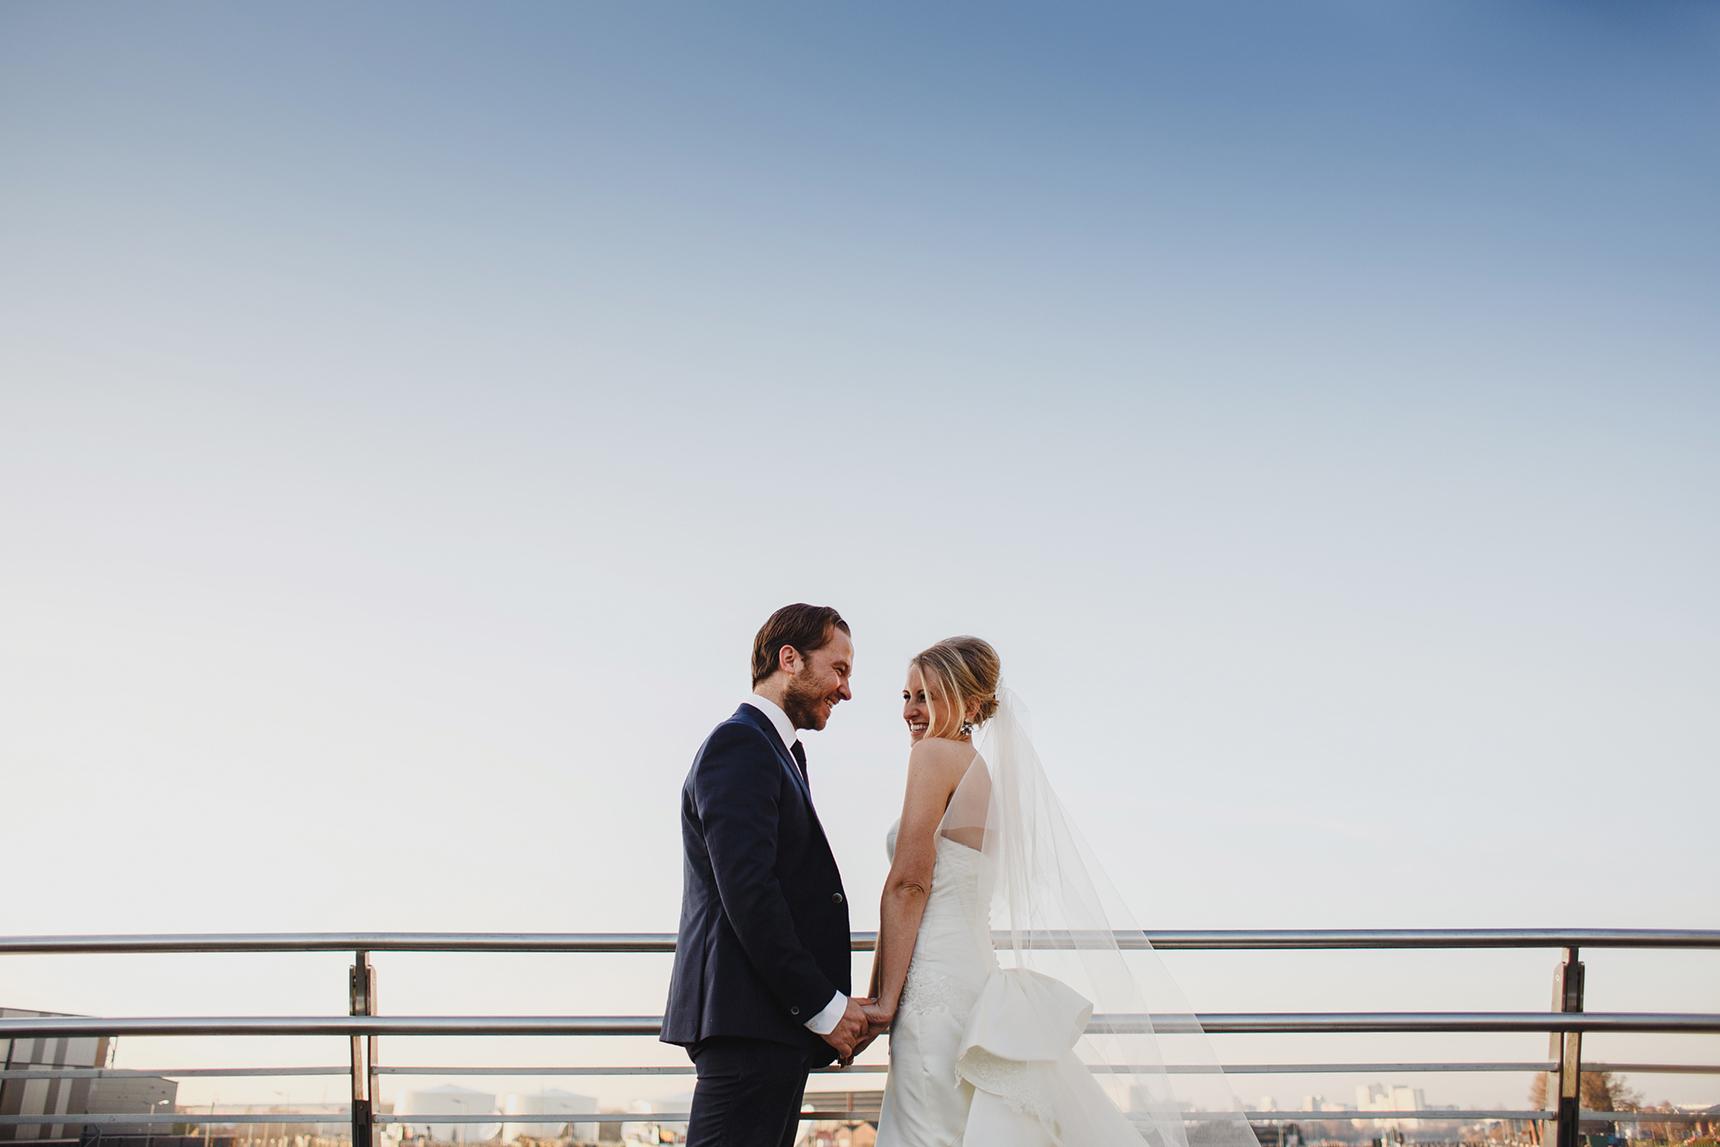 weddings at Media City